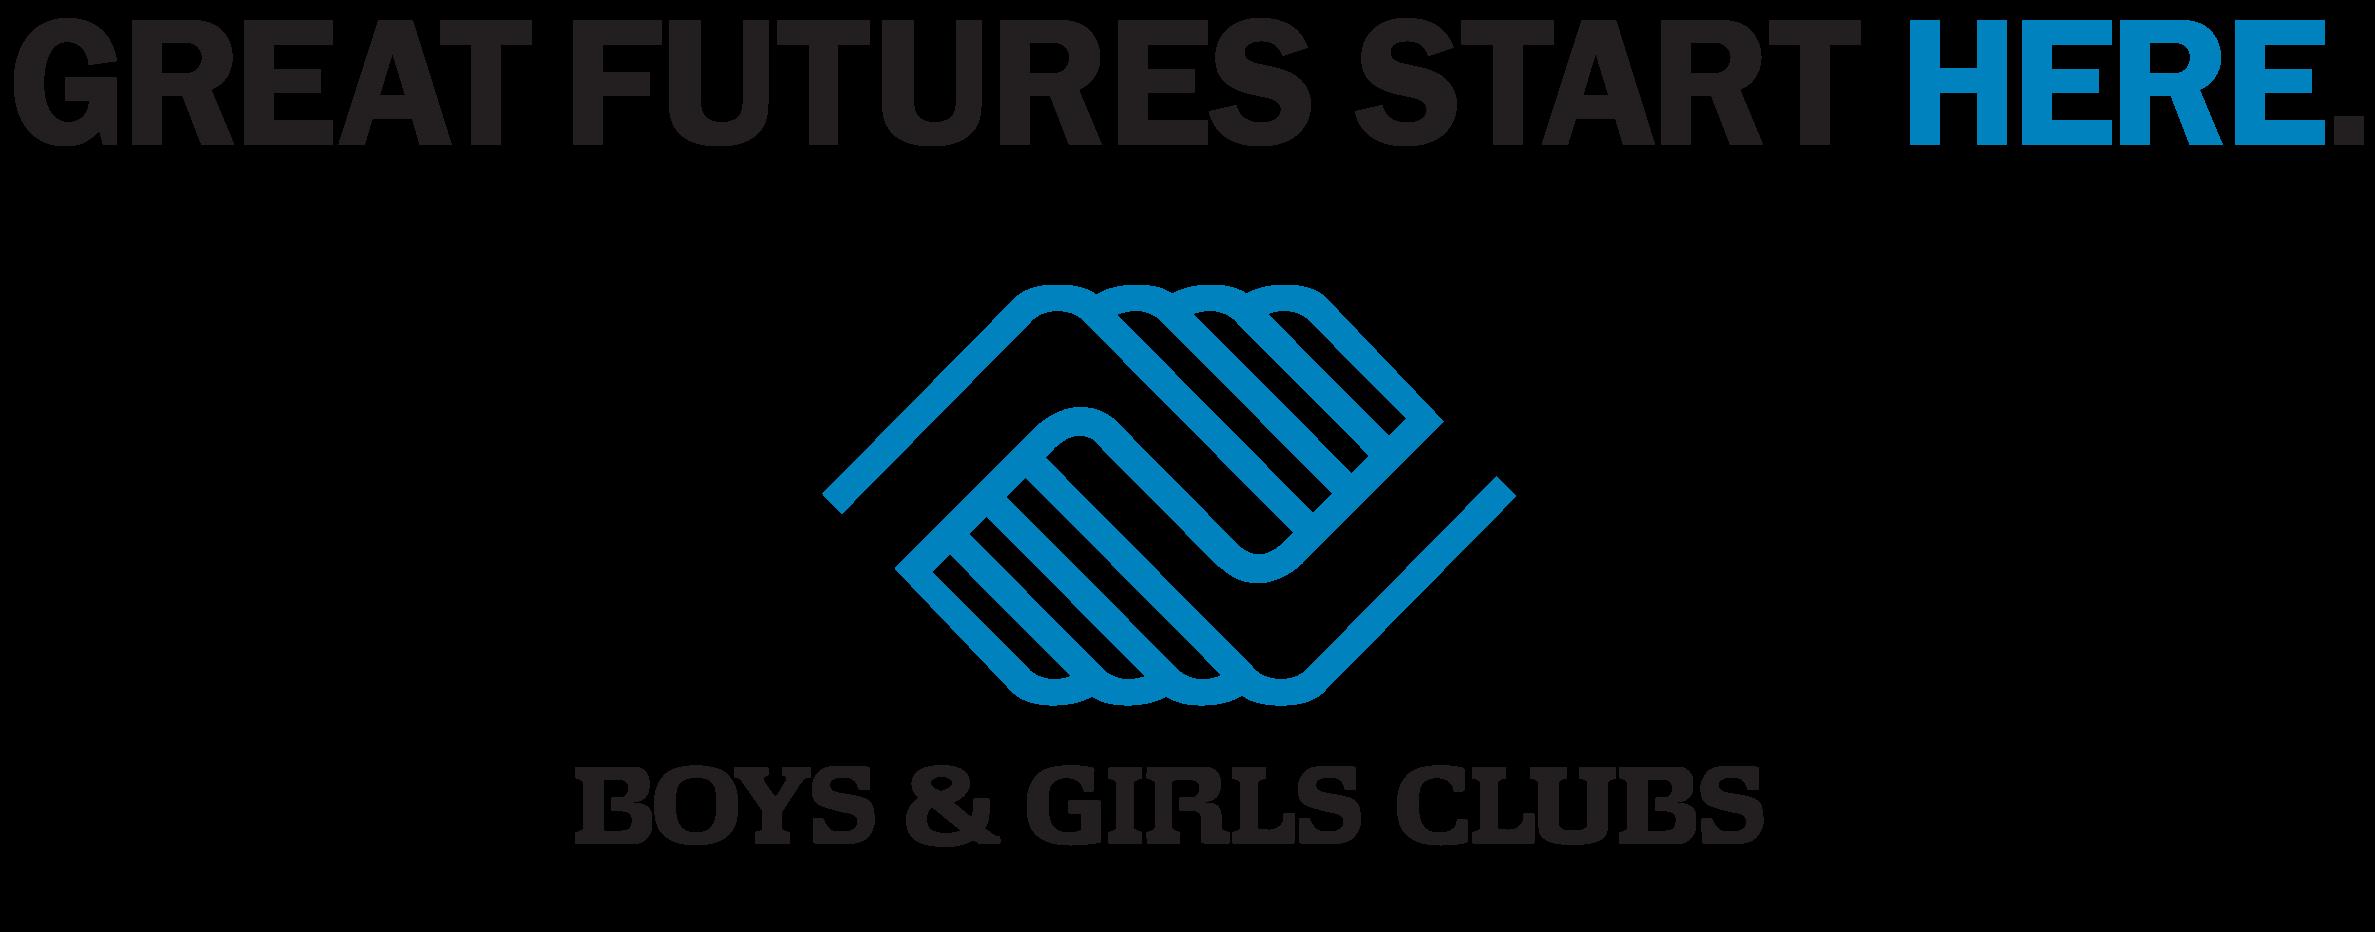 Boys & Girls Clubs of the Coastal Bend